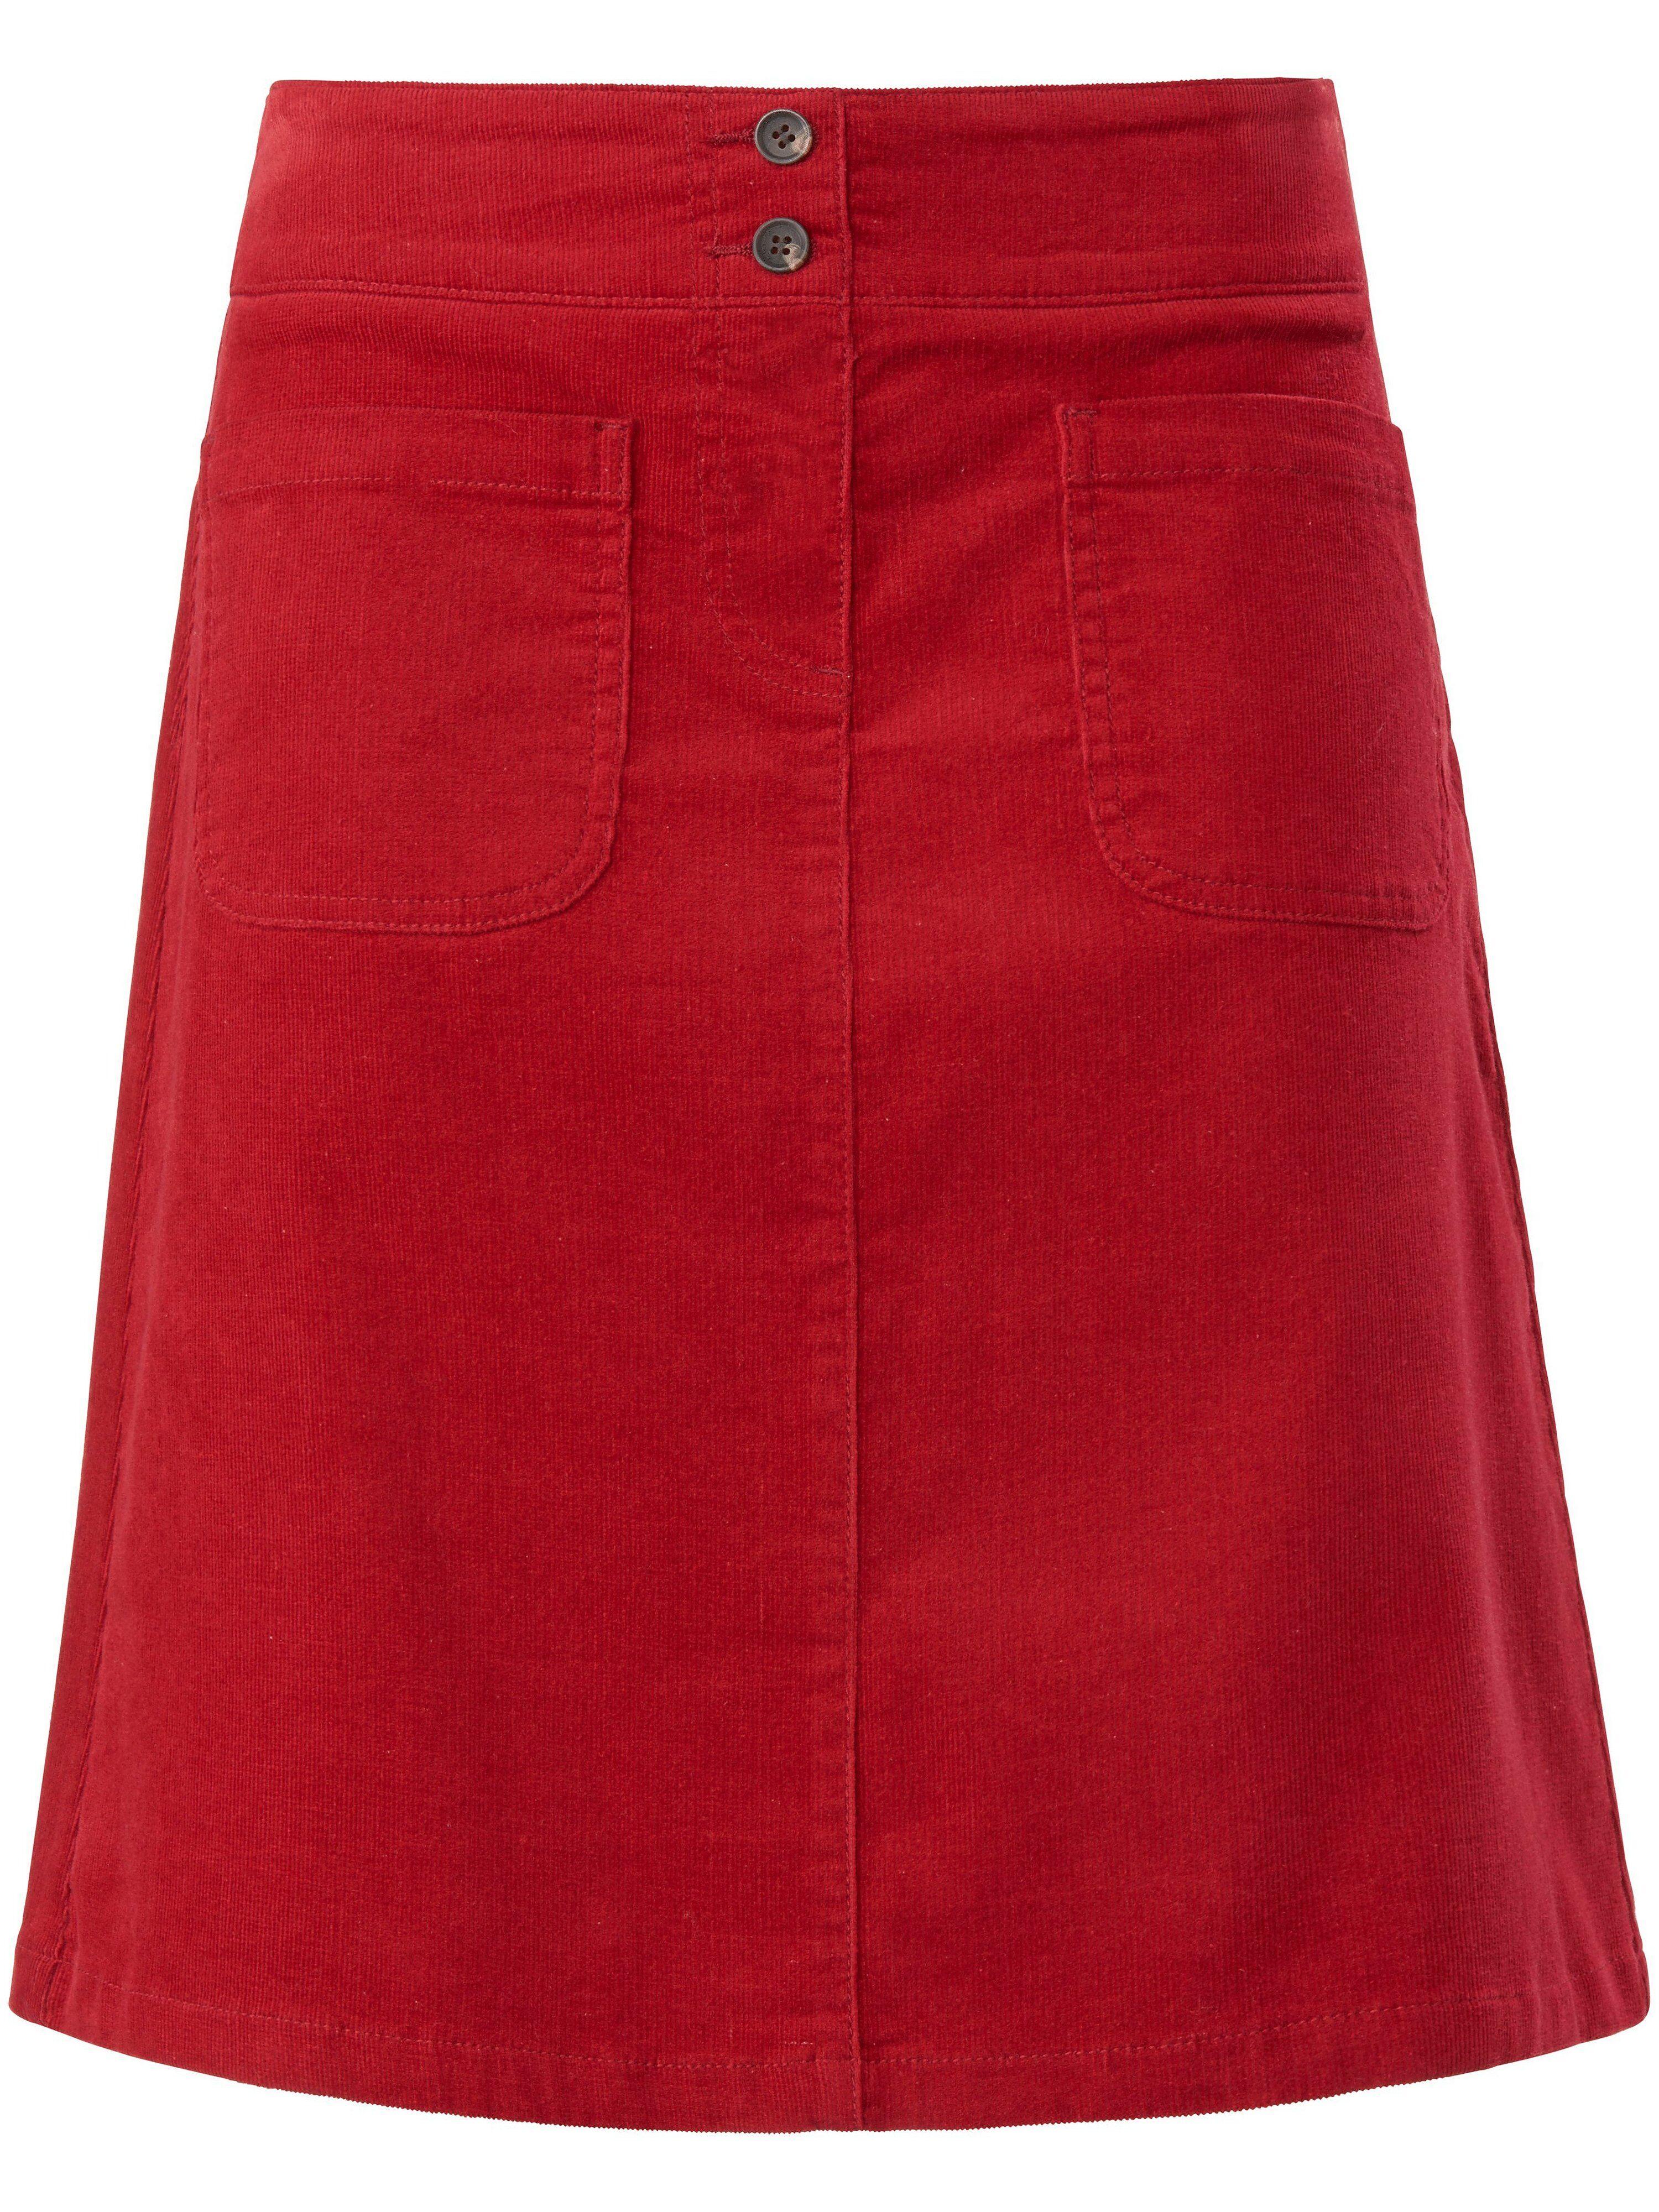 MYBC La jupe en velours milleraies, ligne en A  MYBC rouge  - Femme - 38